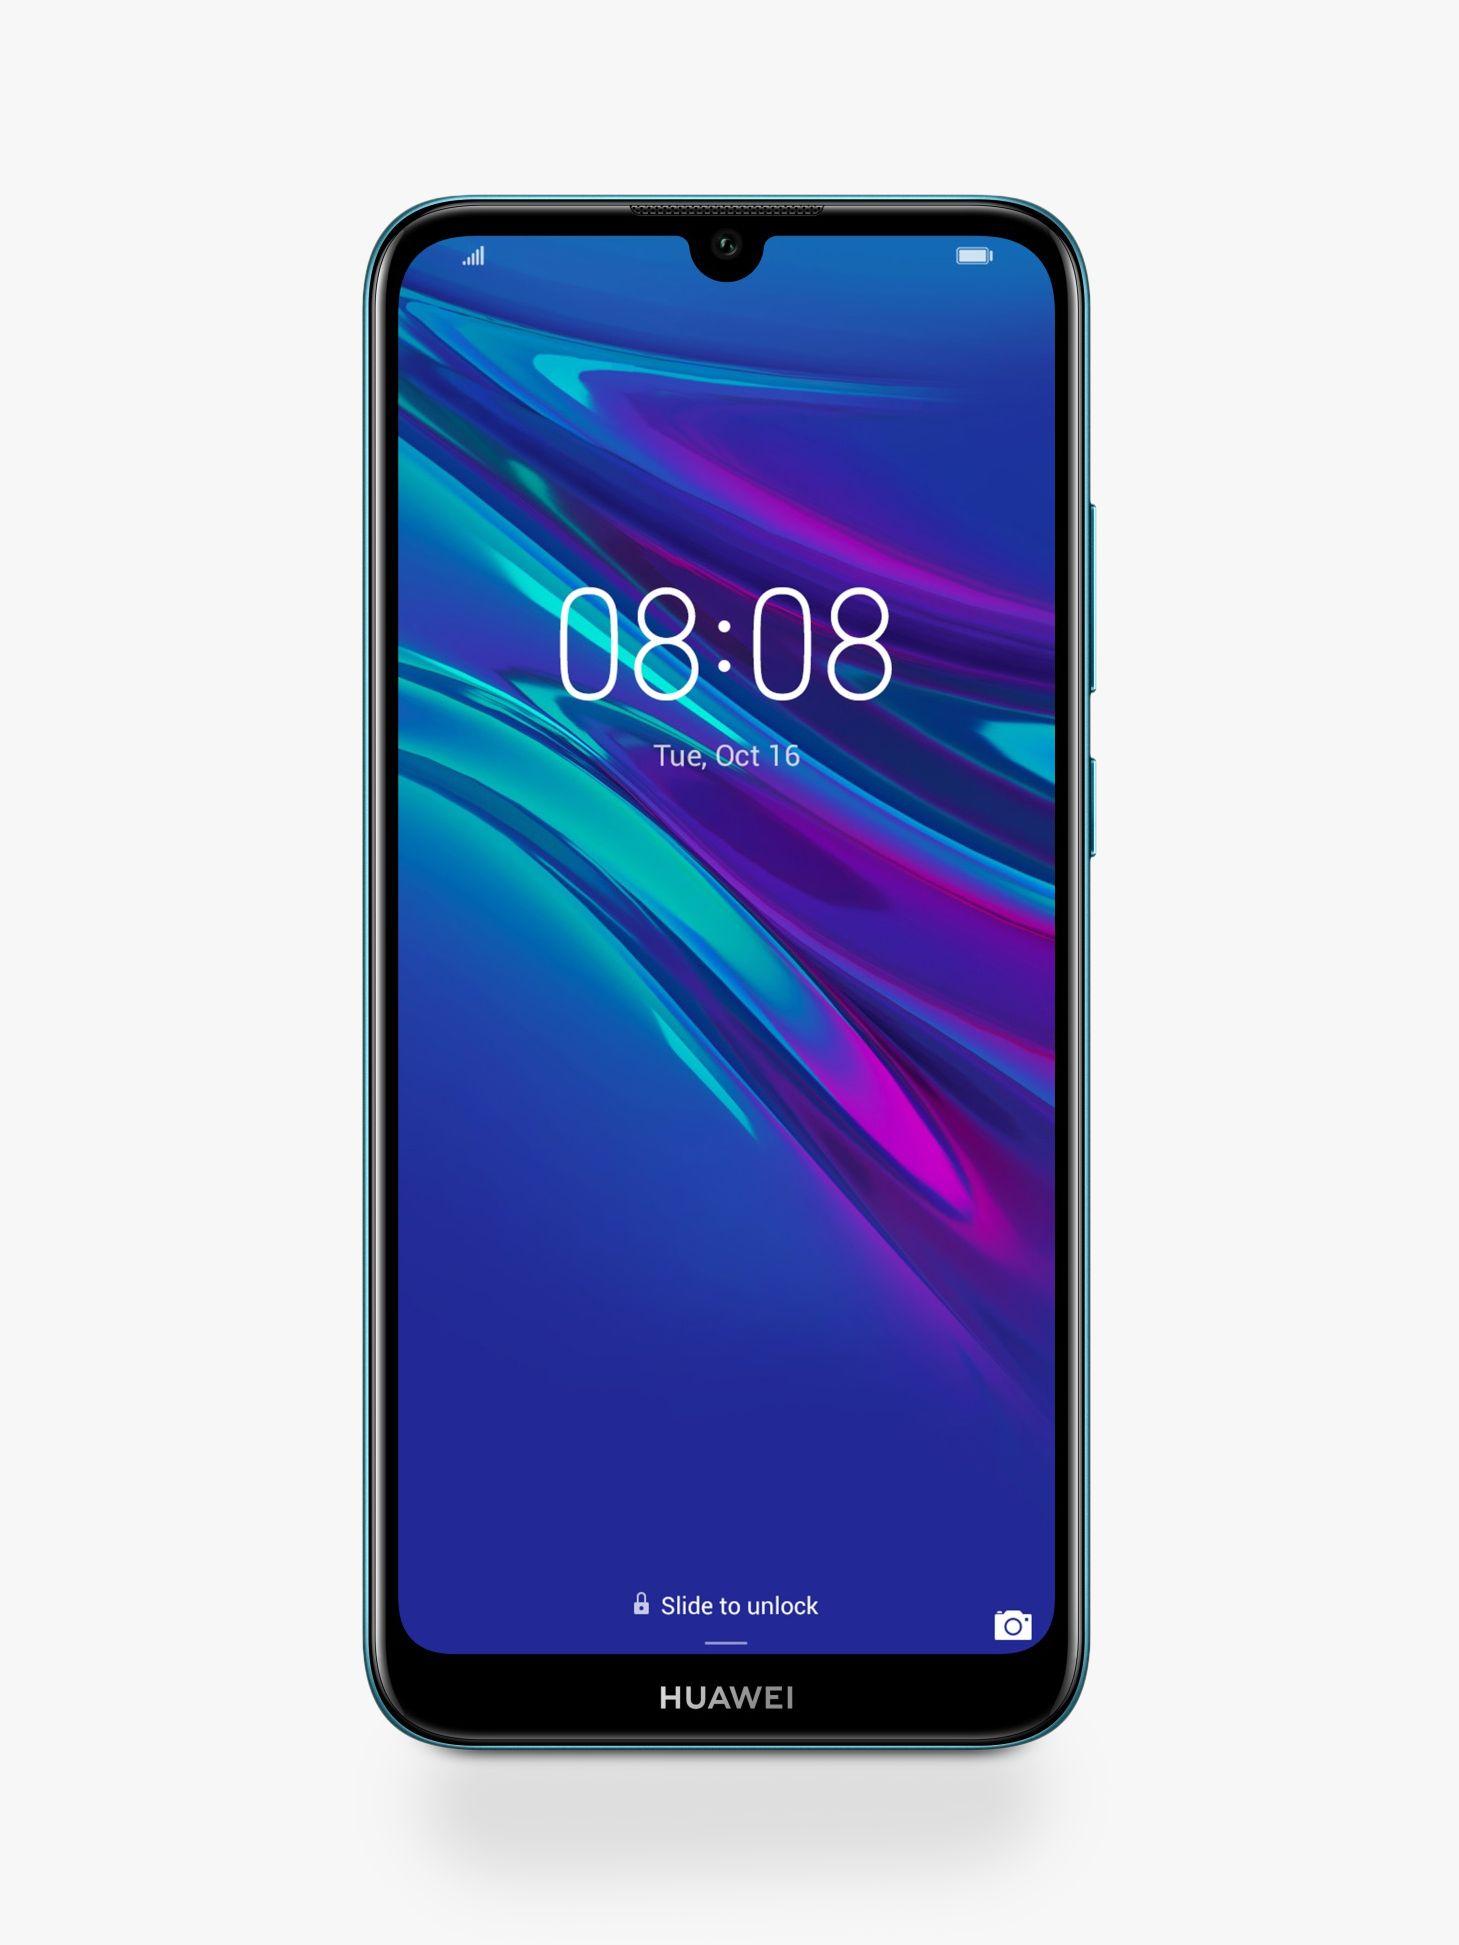 "Huawei Huawei Y6 2019 Smartphone, Android, 2GB RAM, 6.09"", 4G LTE, SIM Free, 32GB"